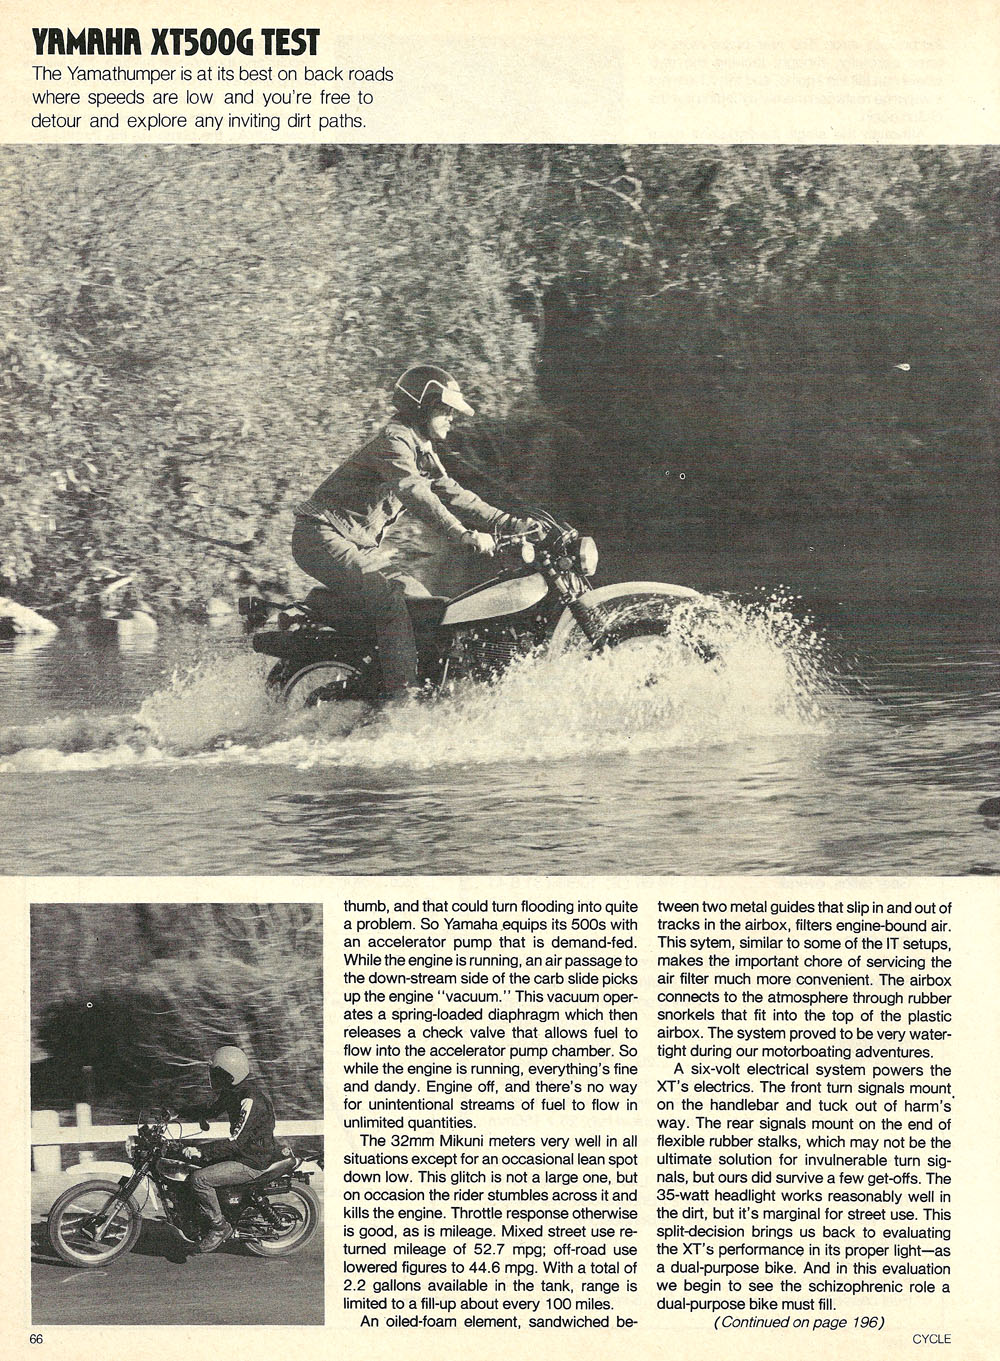 1980 Yamaha XT500G road test 06.jpg